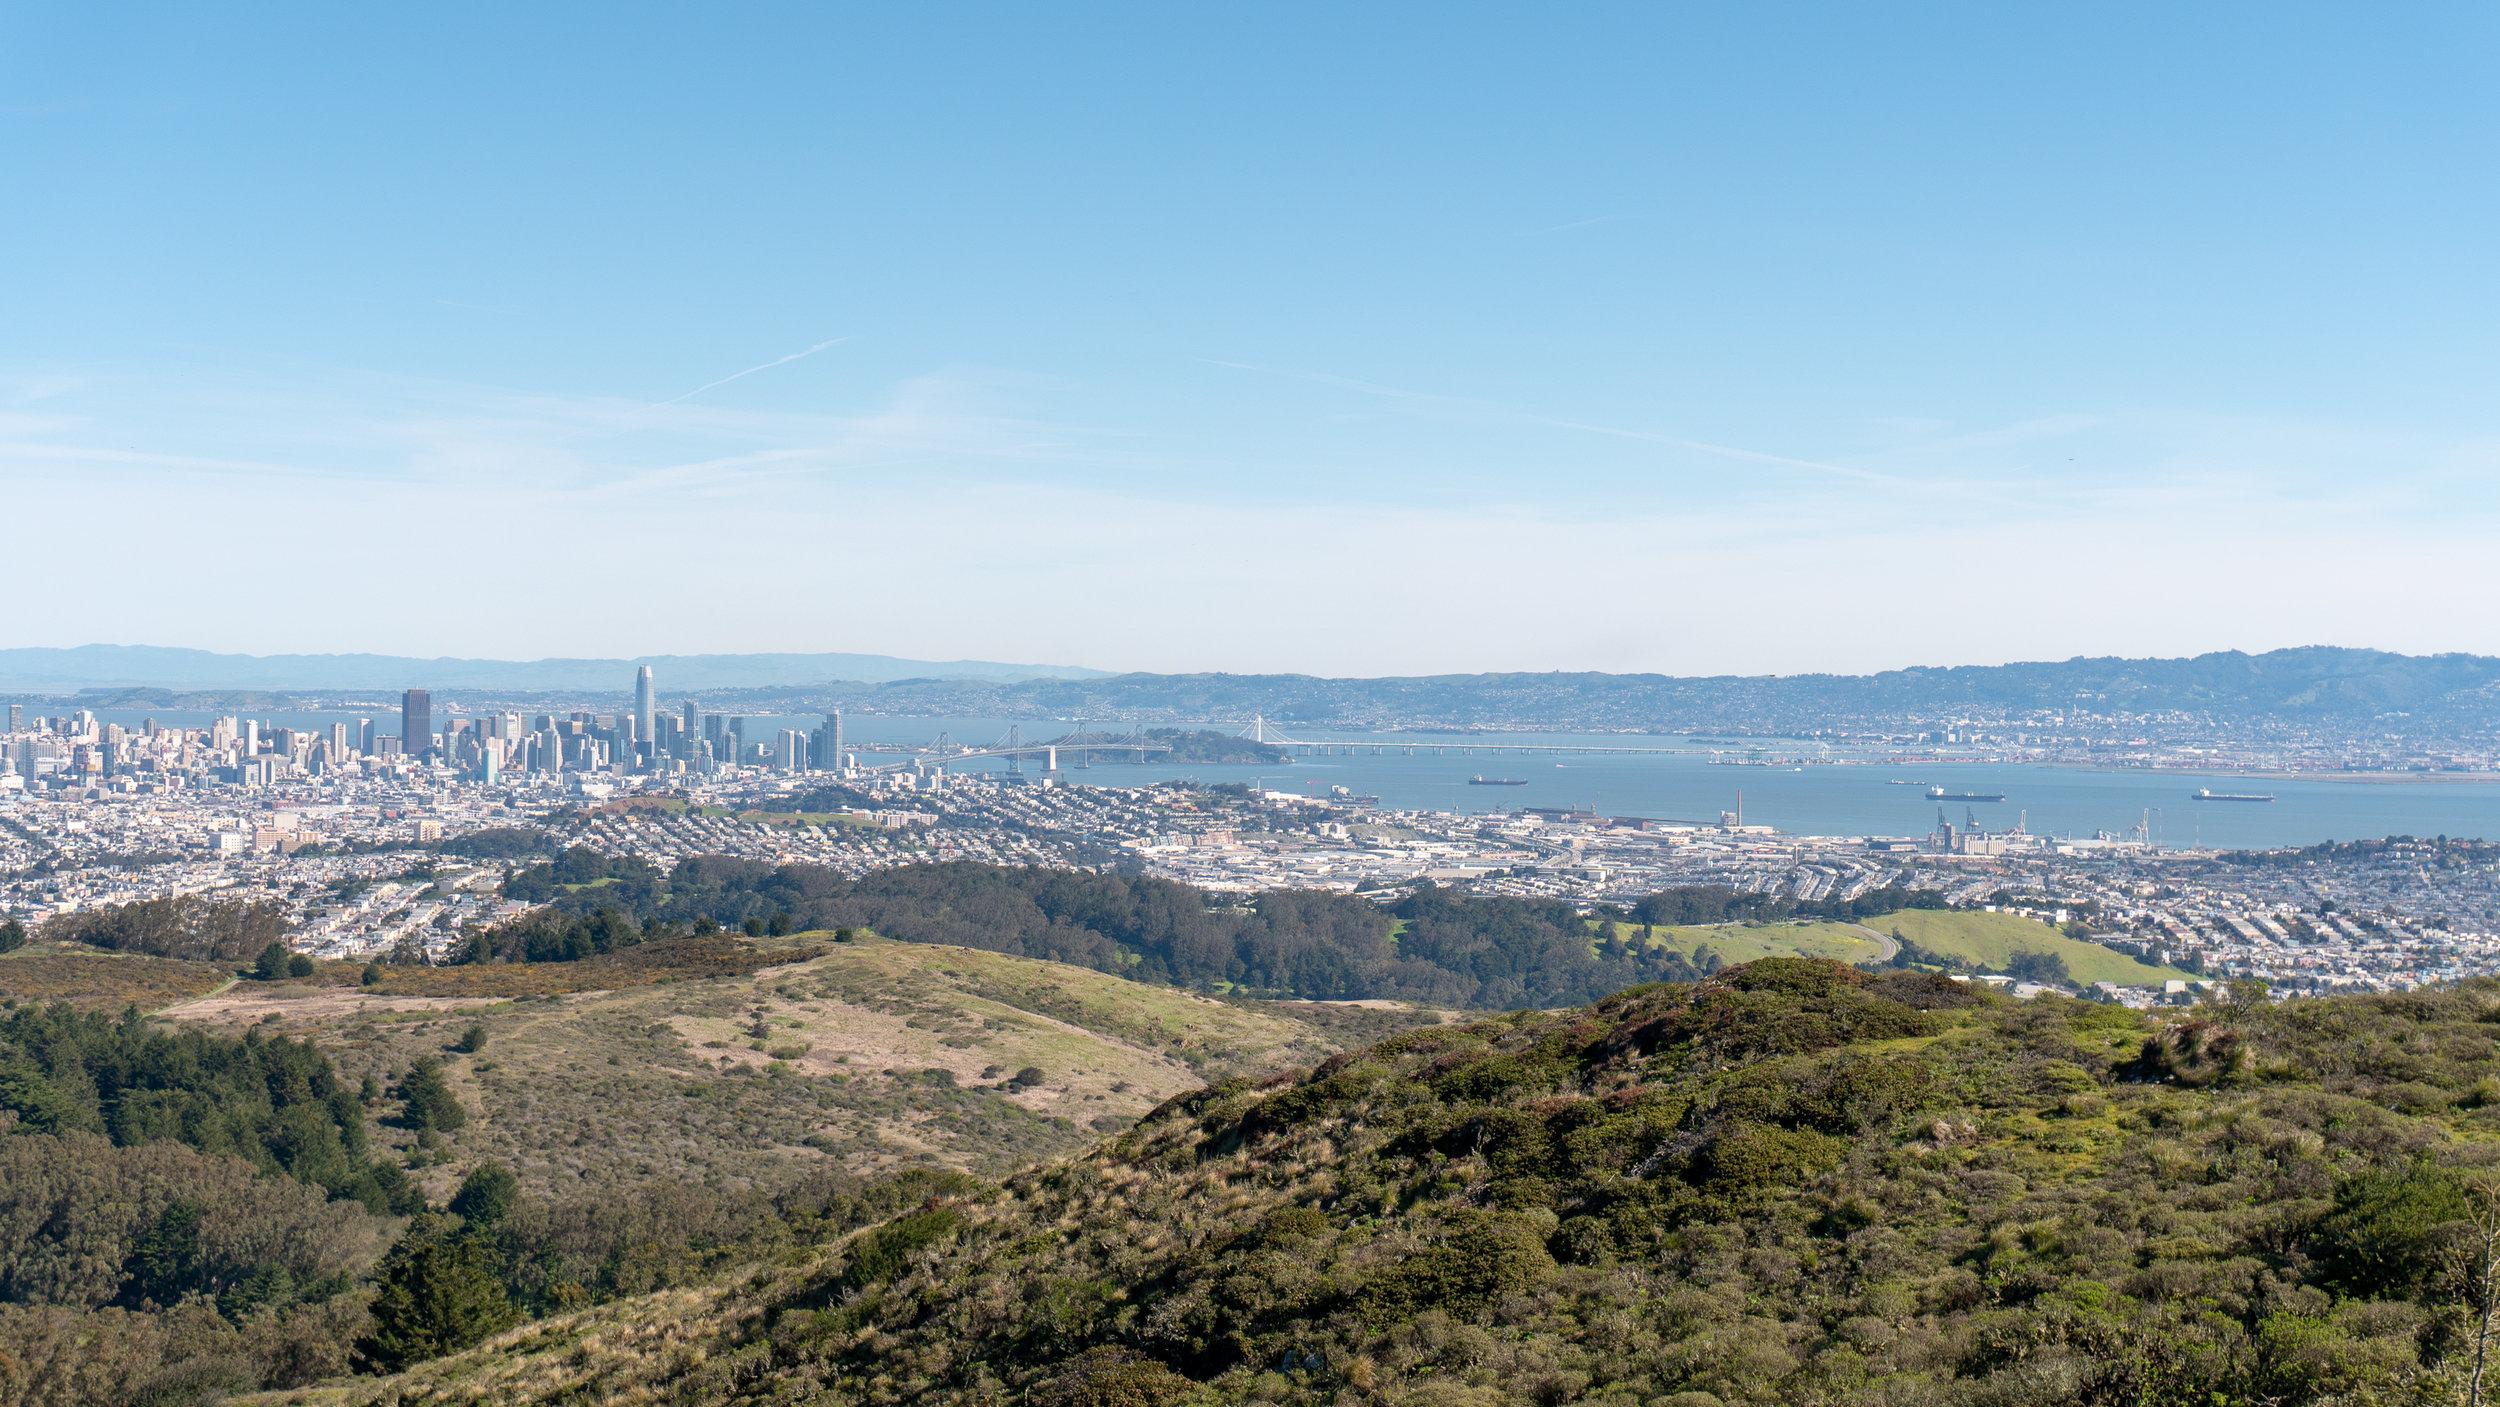 2. San Bruno Mountain Summit Loop (San Francisco)